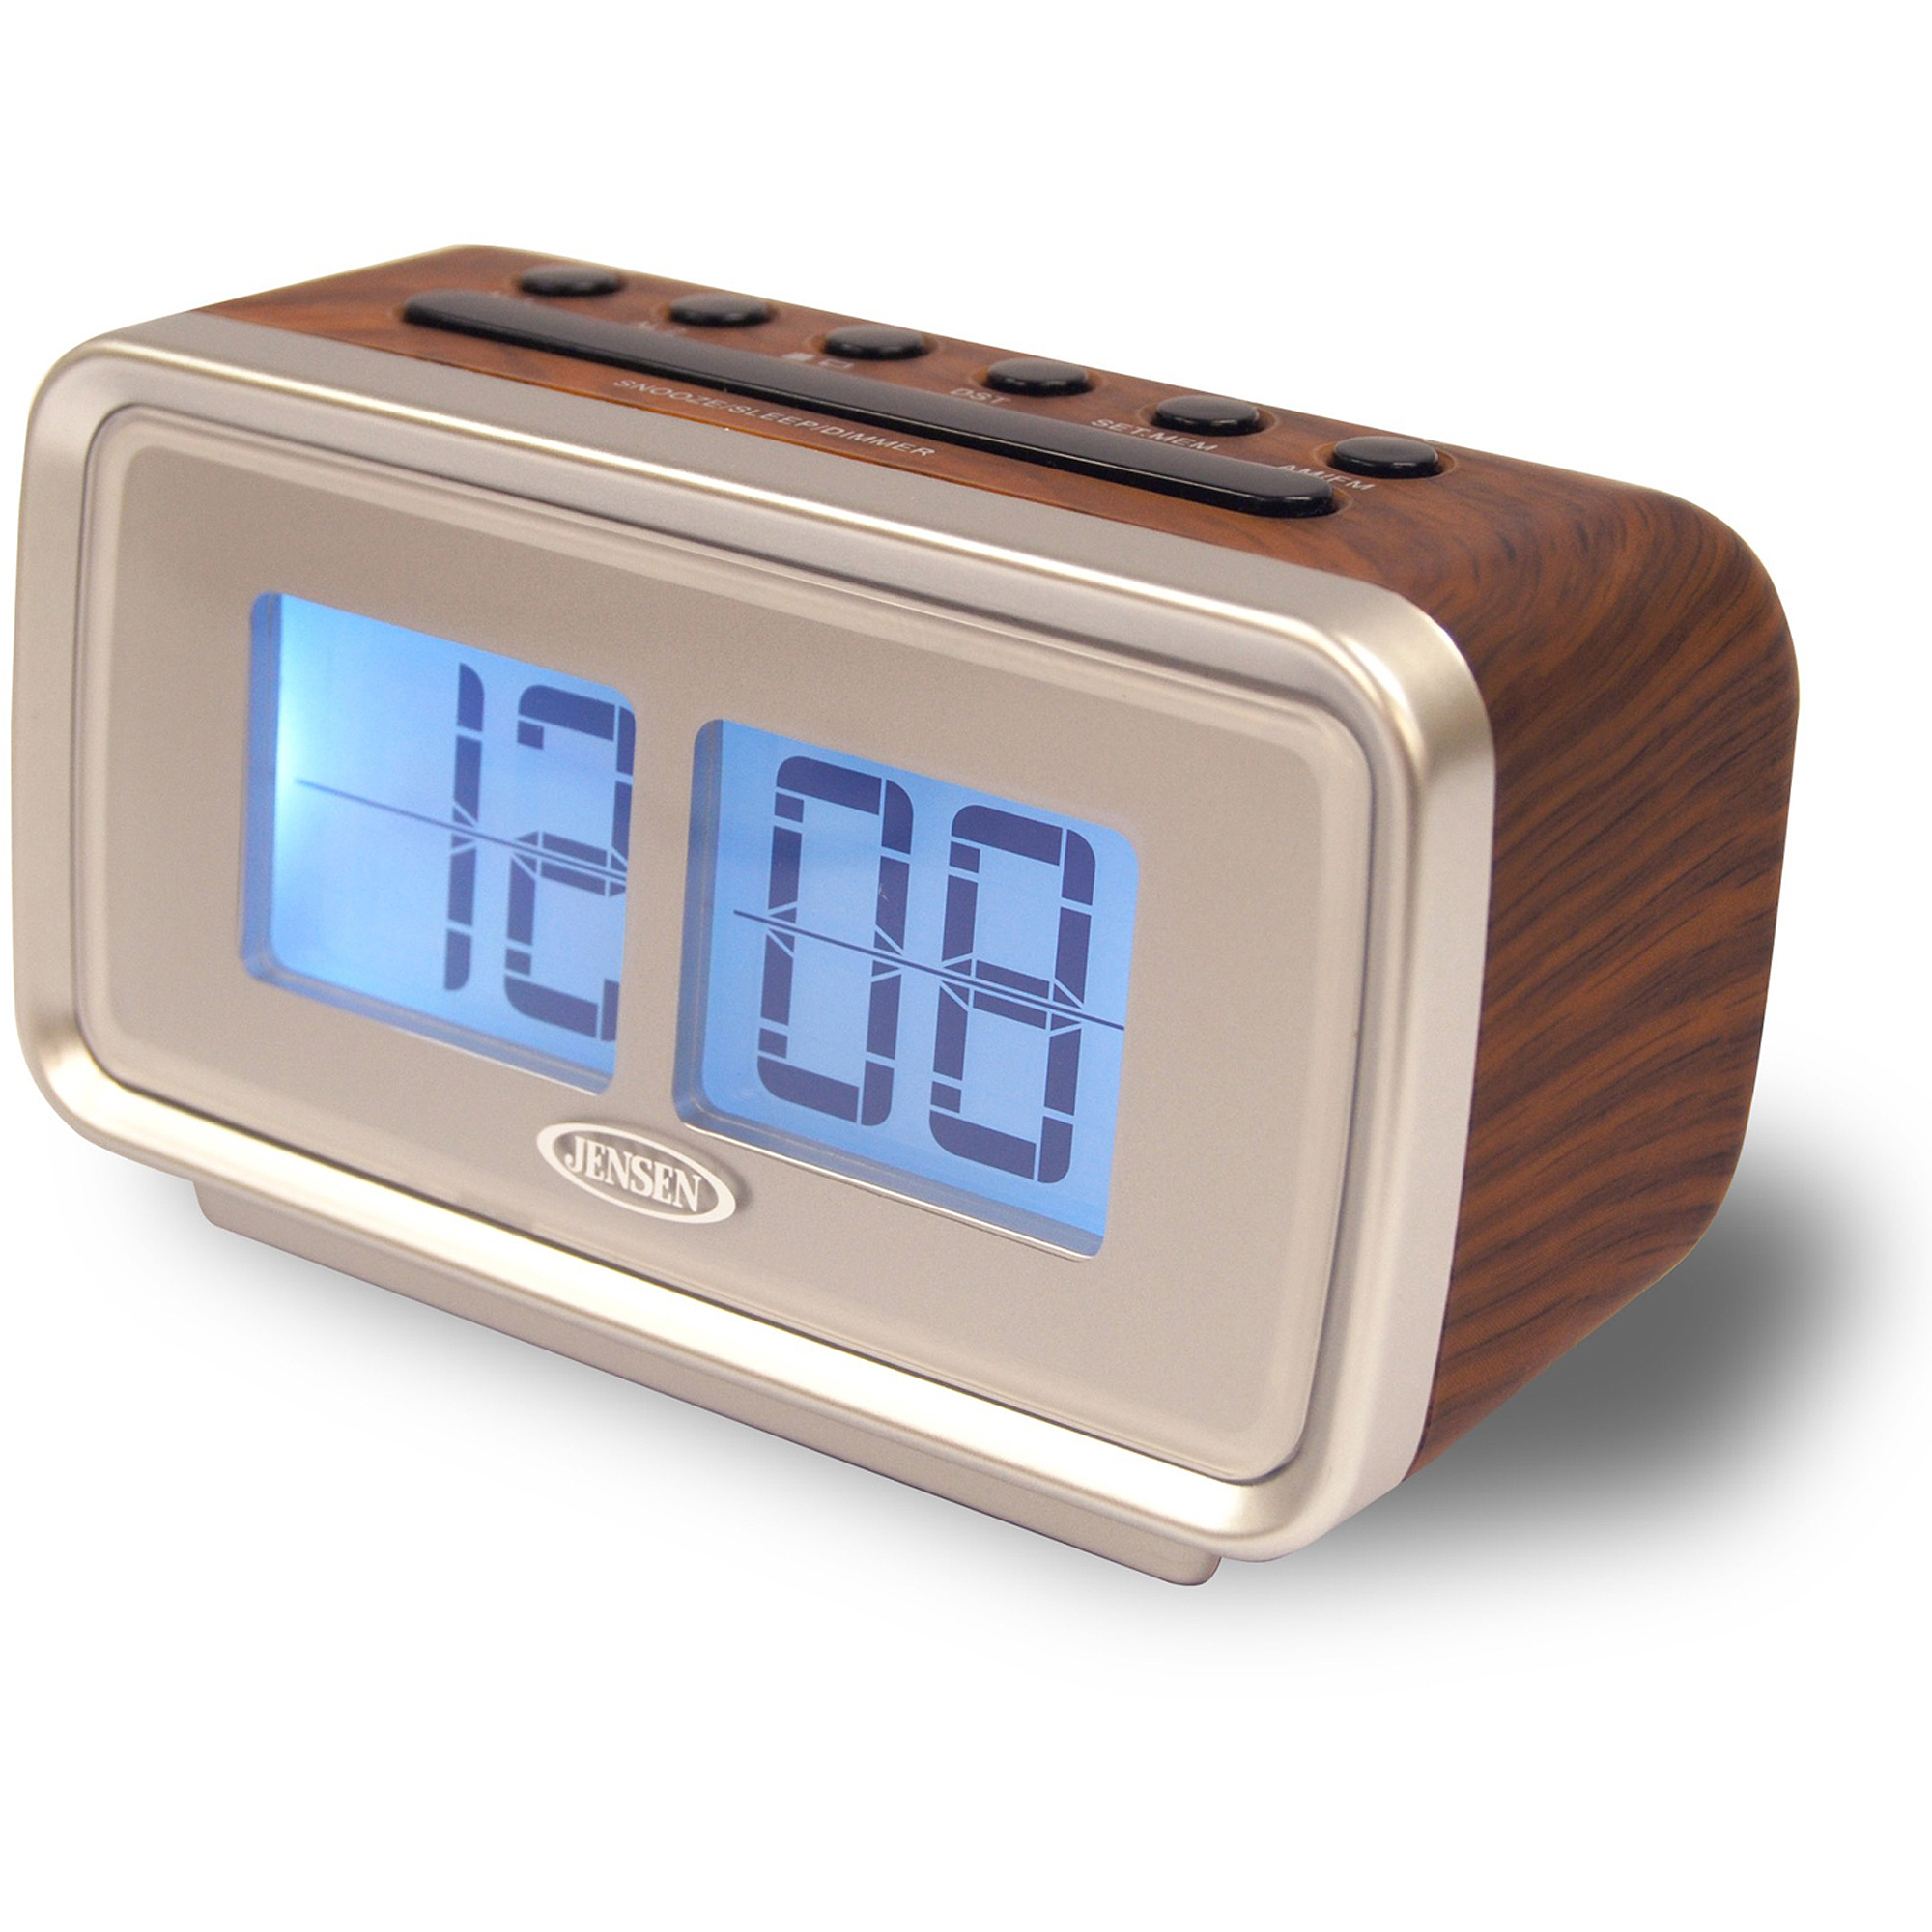 "Jensen AM/FM Dual Alarm Clock with Digital Retro ""Flip"" Display"